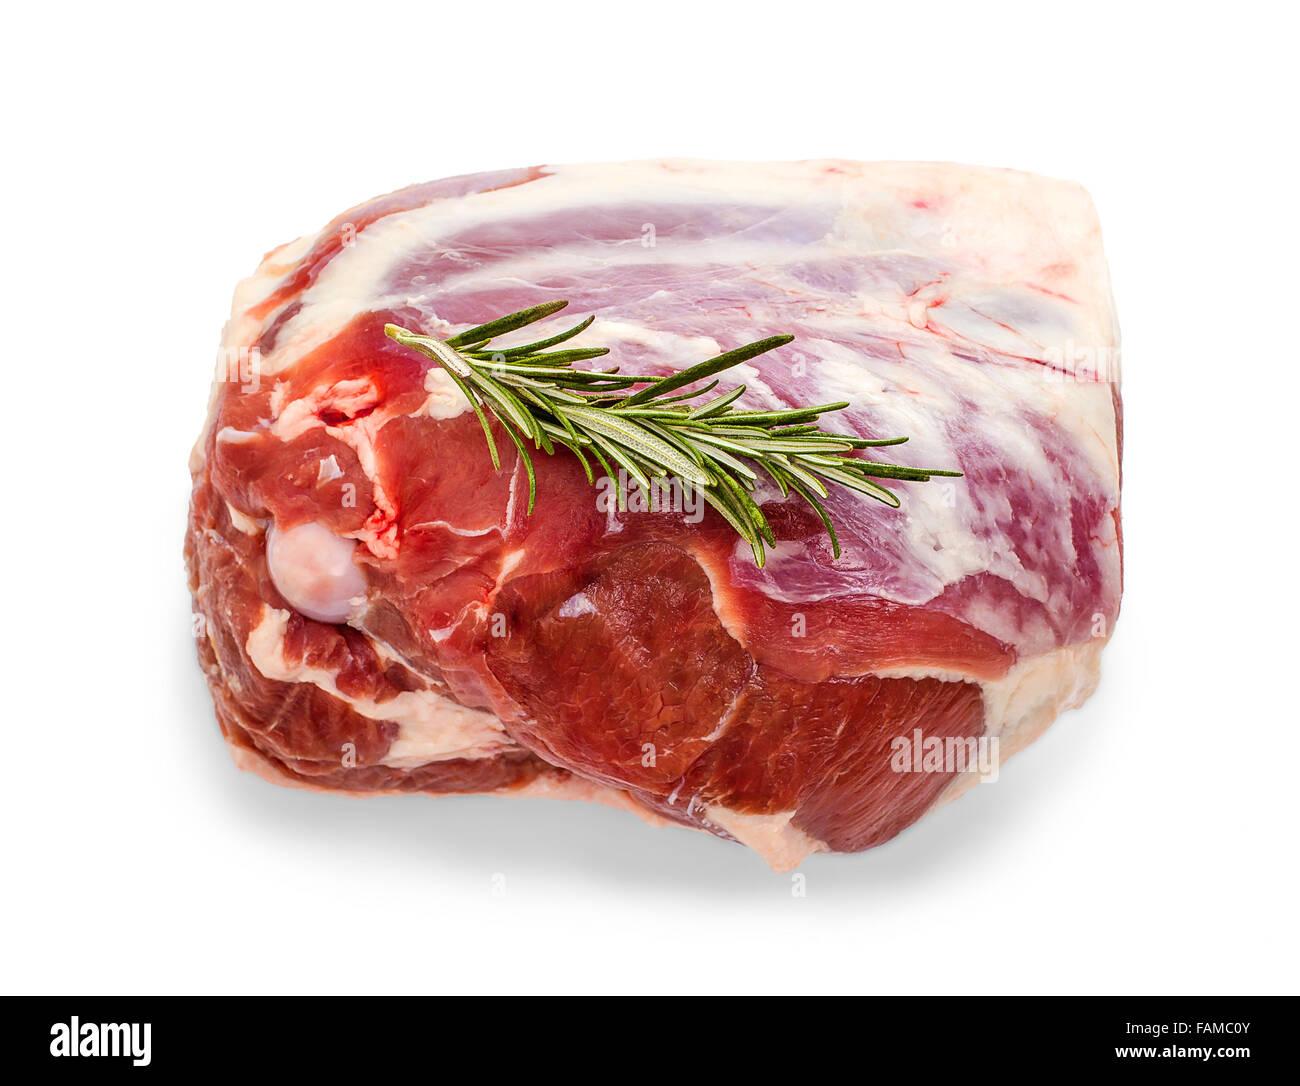 Frozen lamb leg with rosemary twig isolated on white - Stock Image